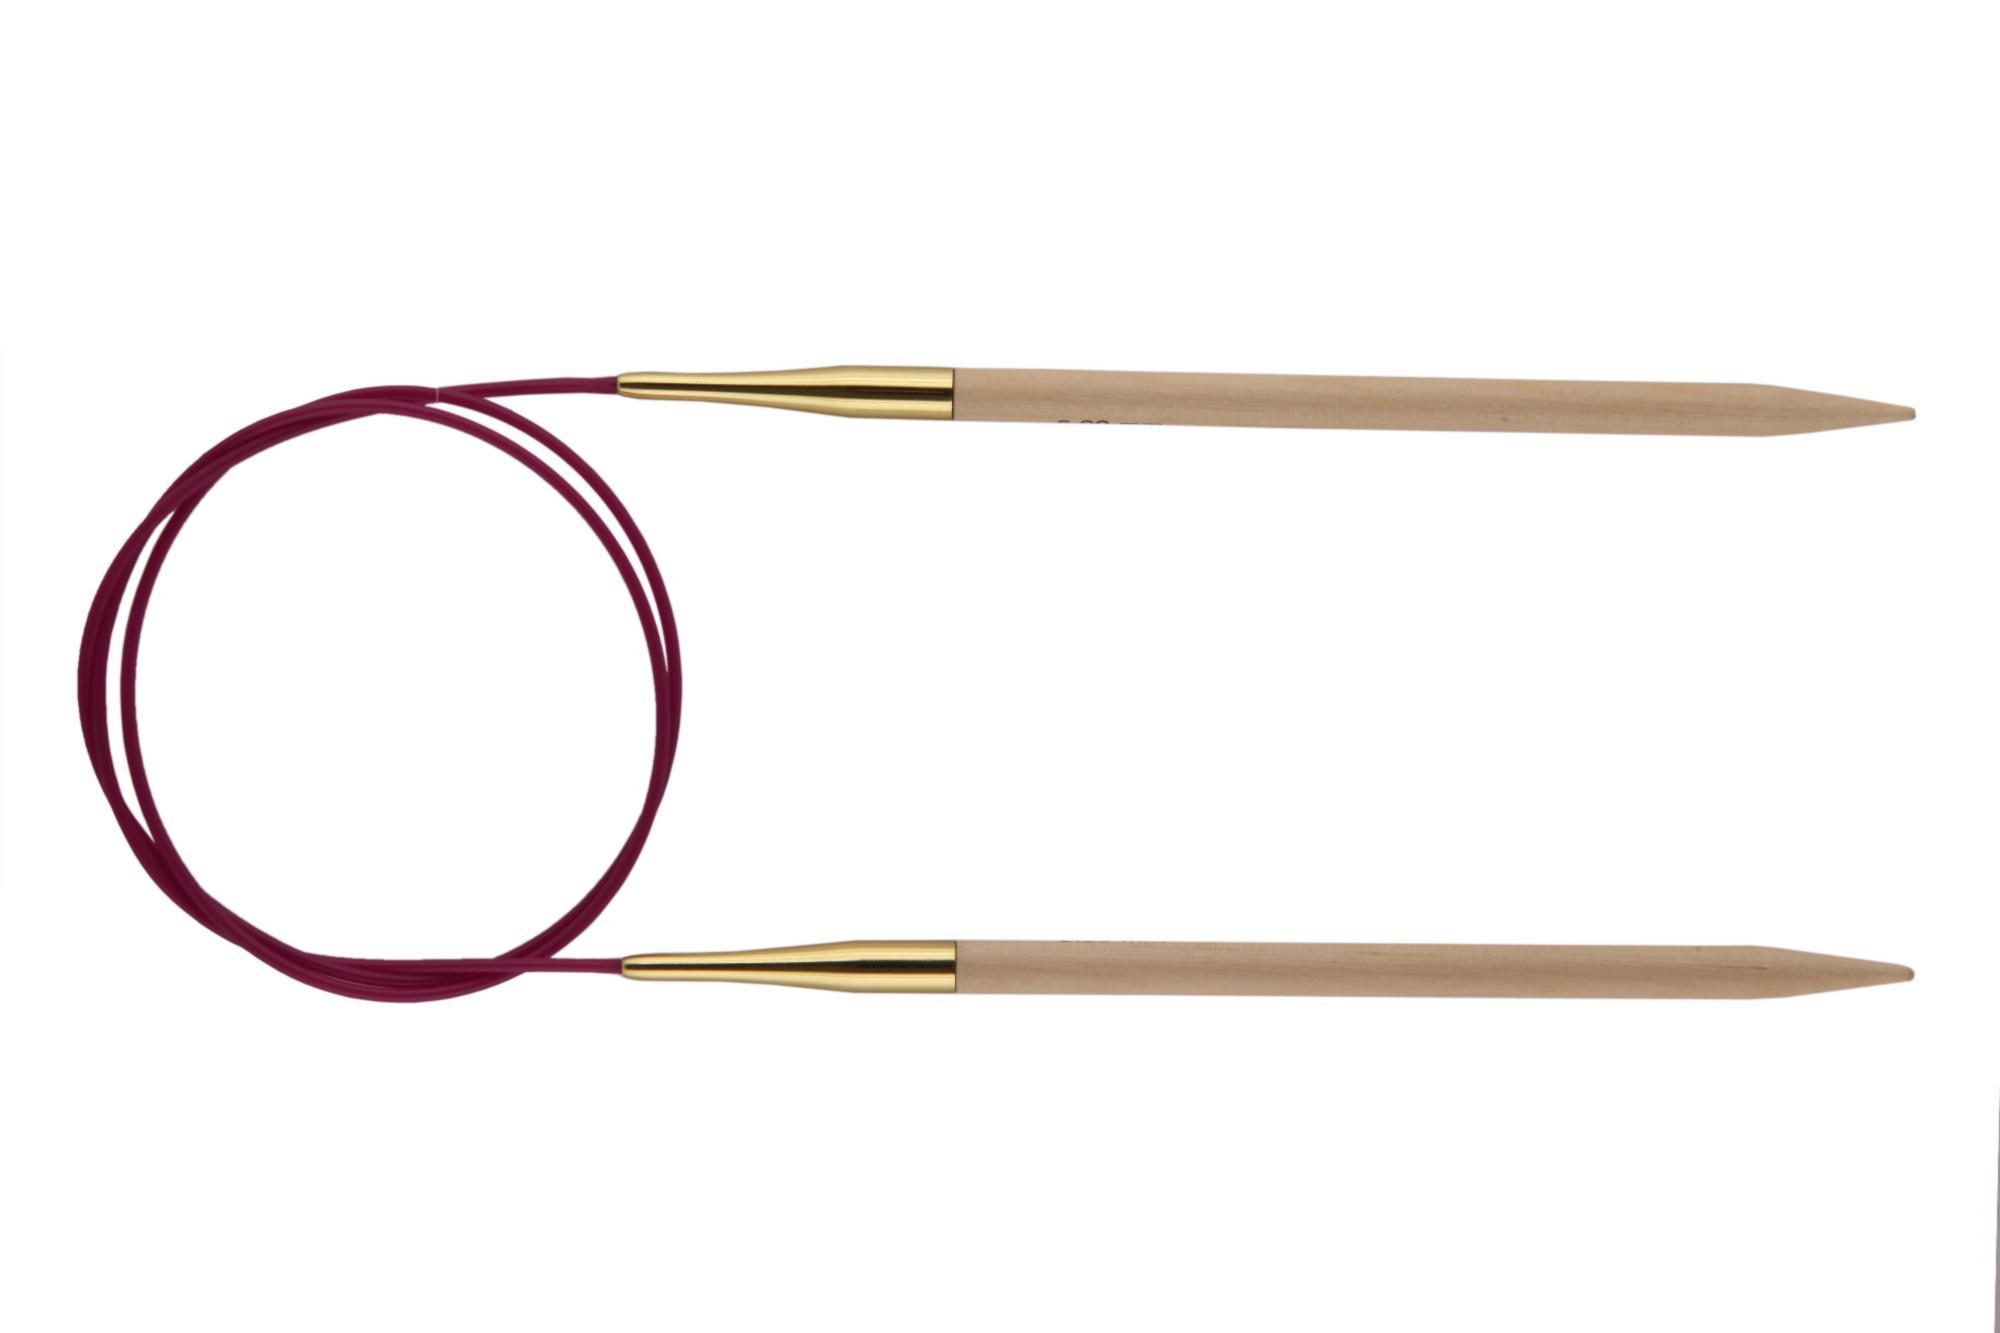 Спицы круговые 150 см Basix Birch Wood KnitPro, 35411, 3.25 мм